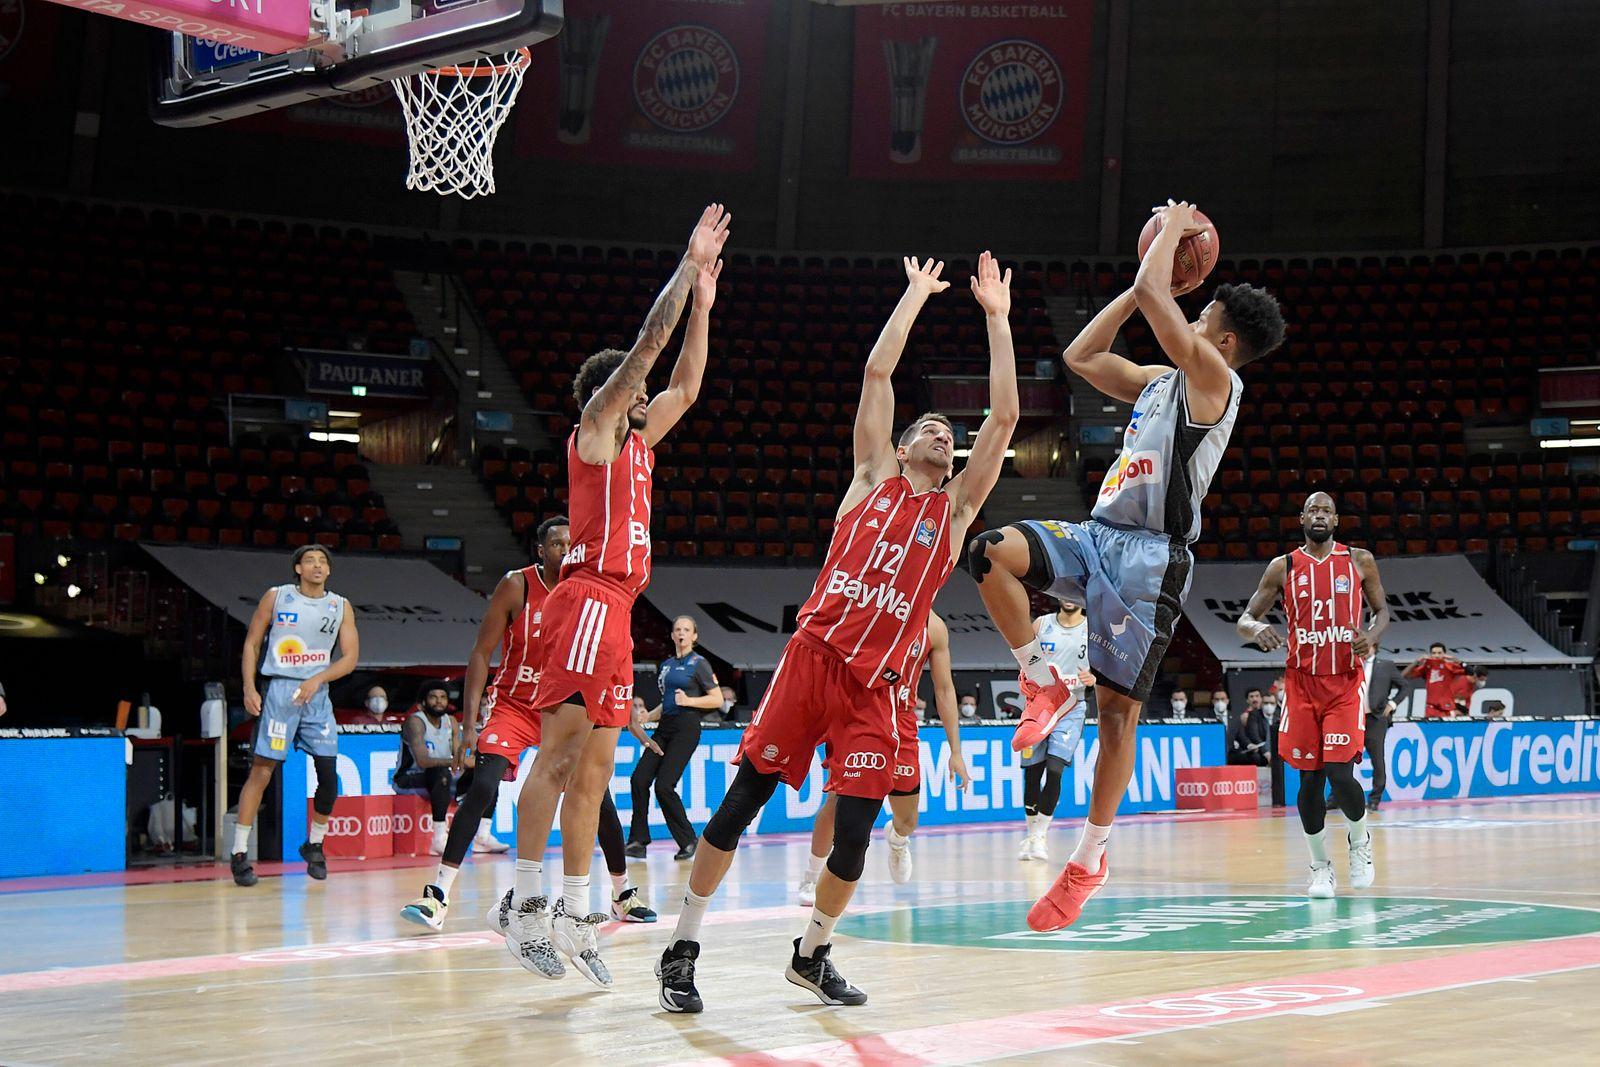 31.01.2021, xemx, Basketball BBL Bundesliga, FC Bayern Muenchen Basketball - HAKRO Merlins Crailsheim emspor, v.l. Nick